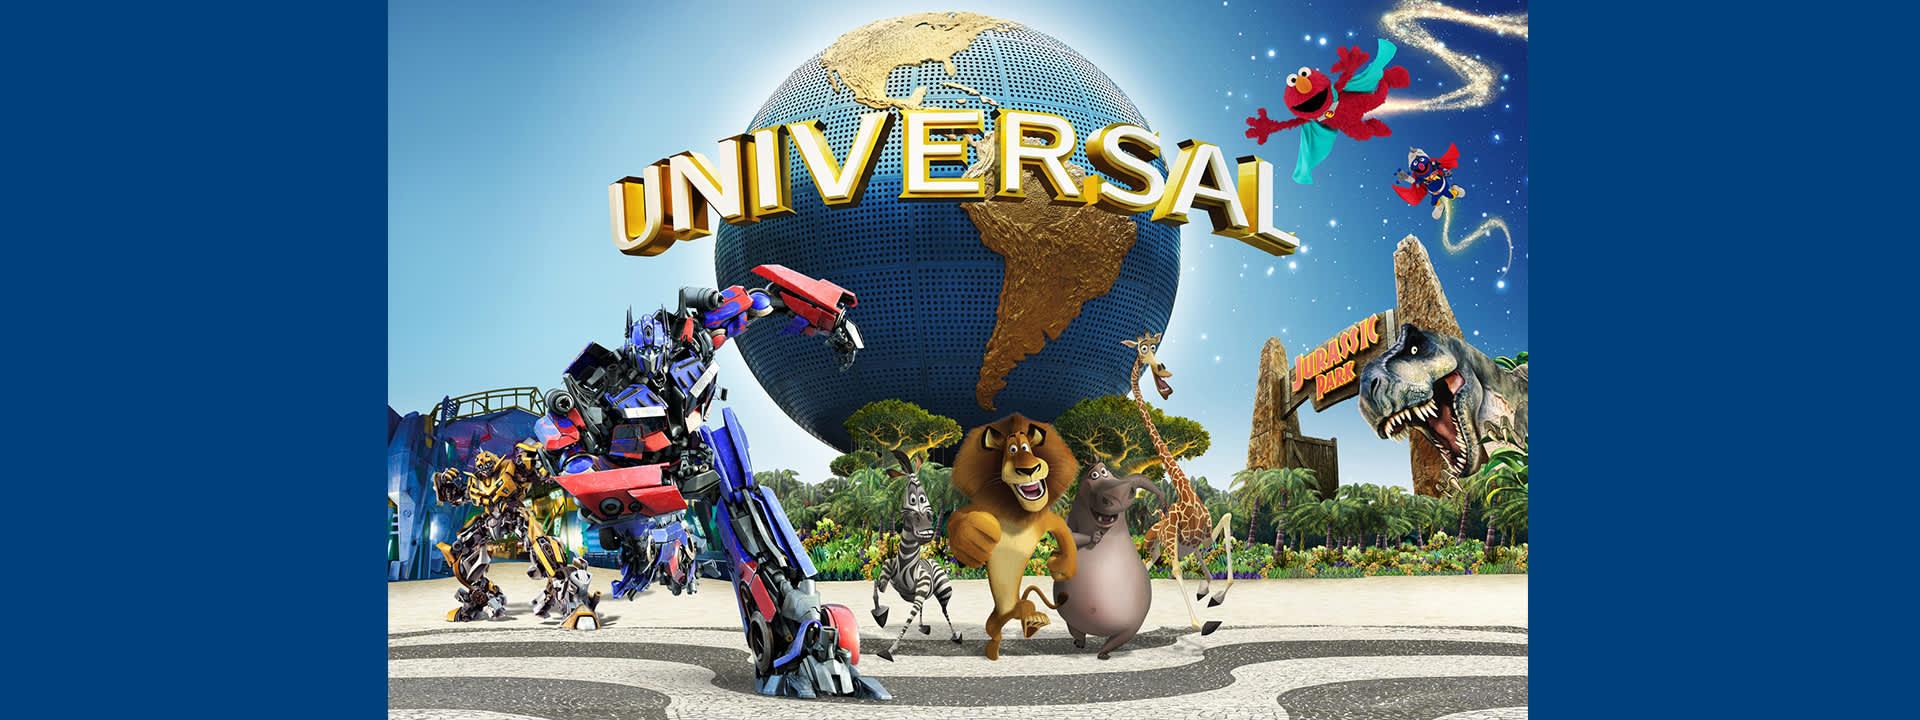 Universal Studios Singapore Ticket (1 Day Pass) - Klook